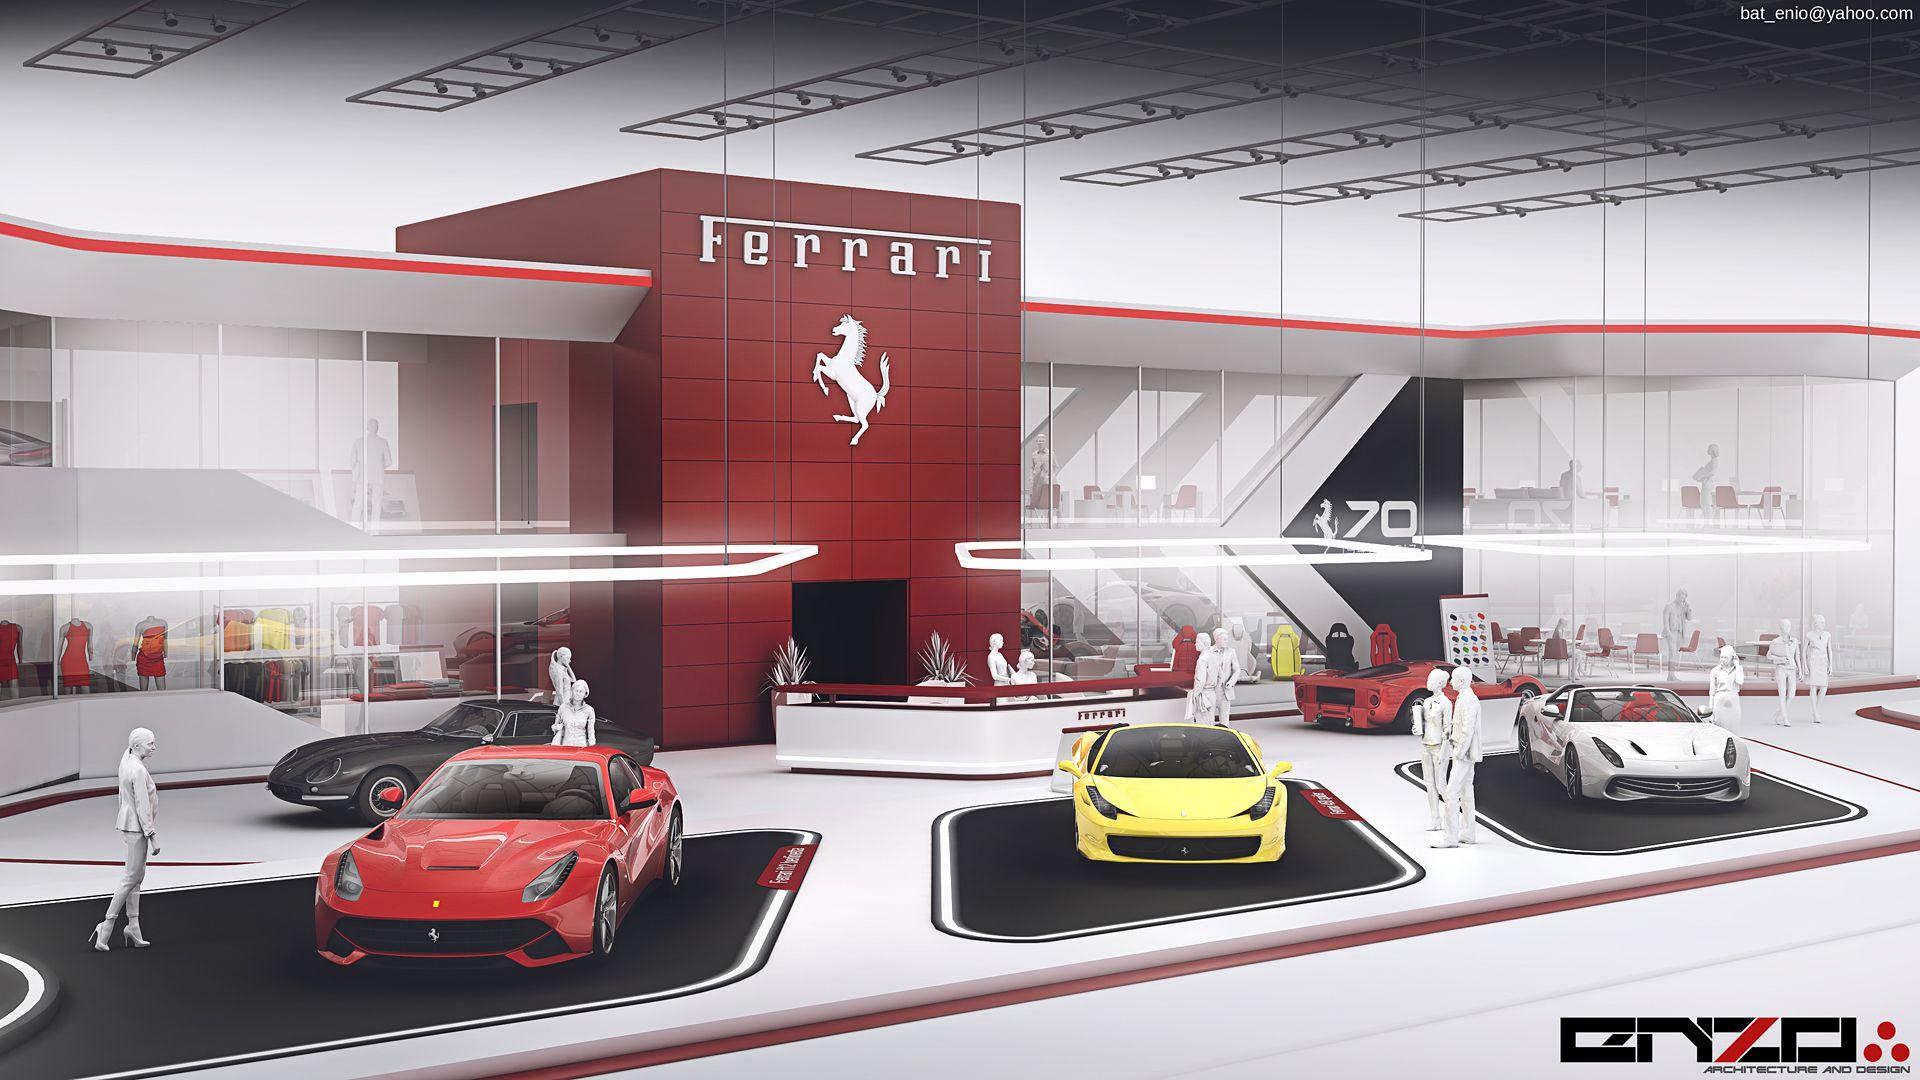 Ferrari Expo Stand Concept 2017 On Behance Expo Stand Ferrari